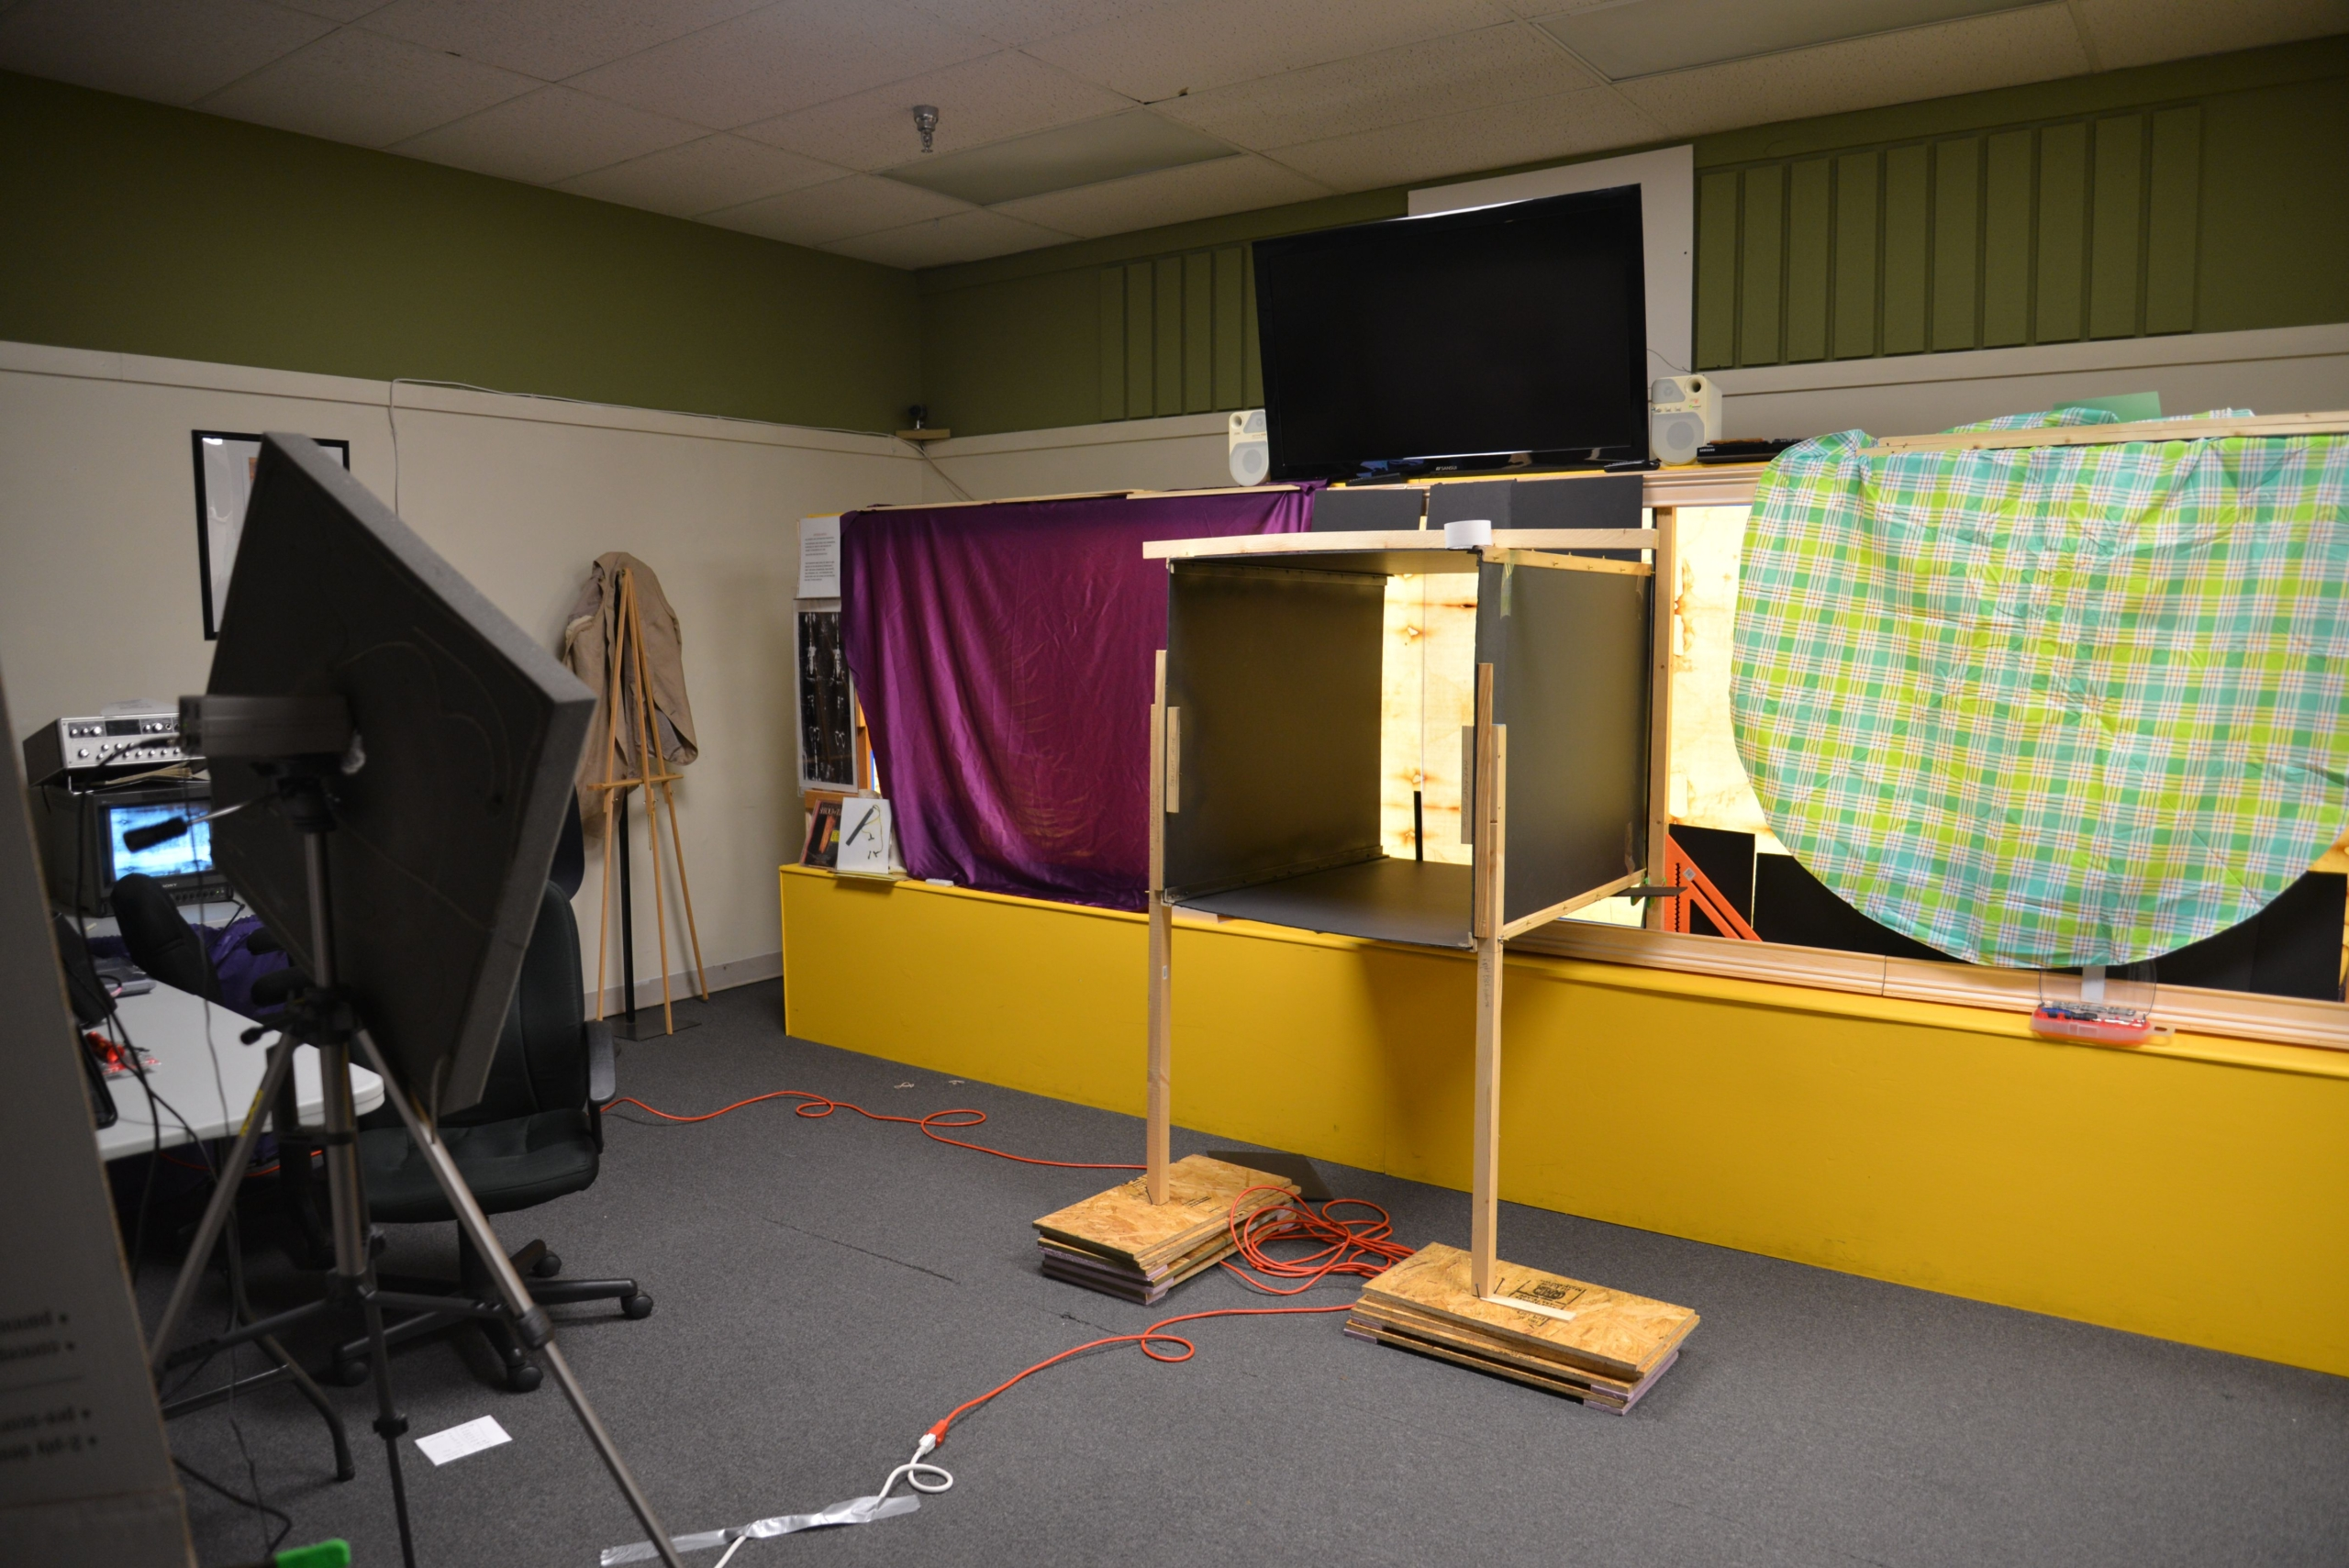 Photo D. Preparing research set-up